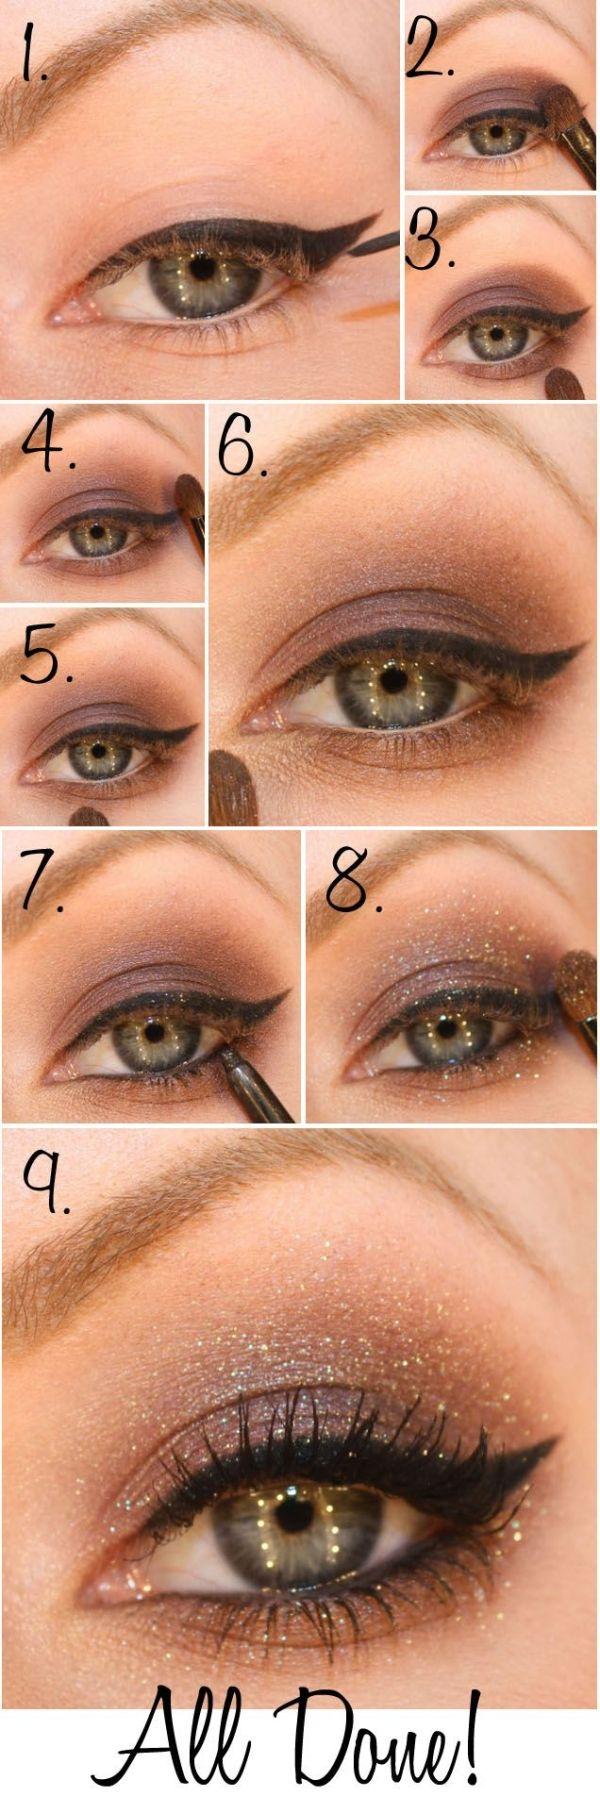 Amanda Seyfried inspired eye shadow tutorial by Miracle72